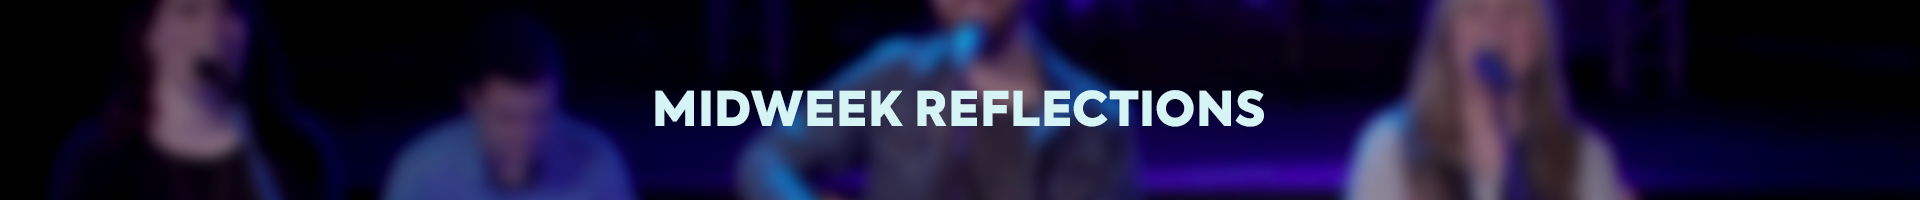 Midweek Reflections Banner b.jpg